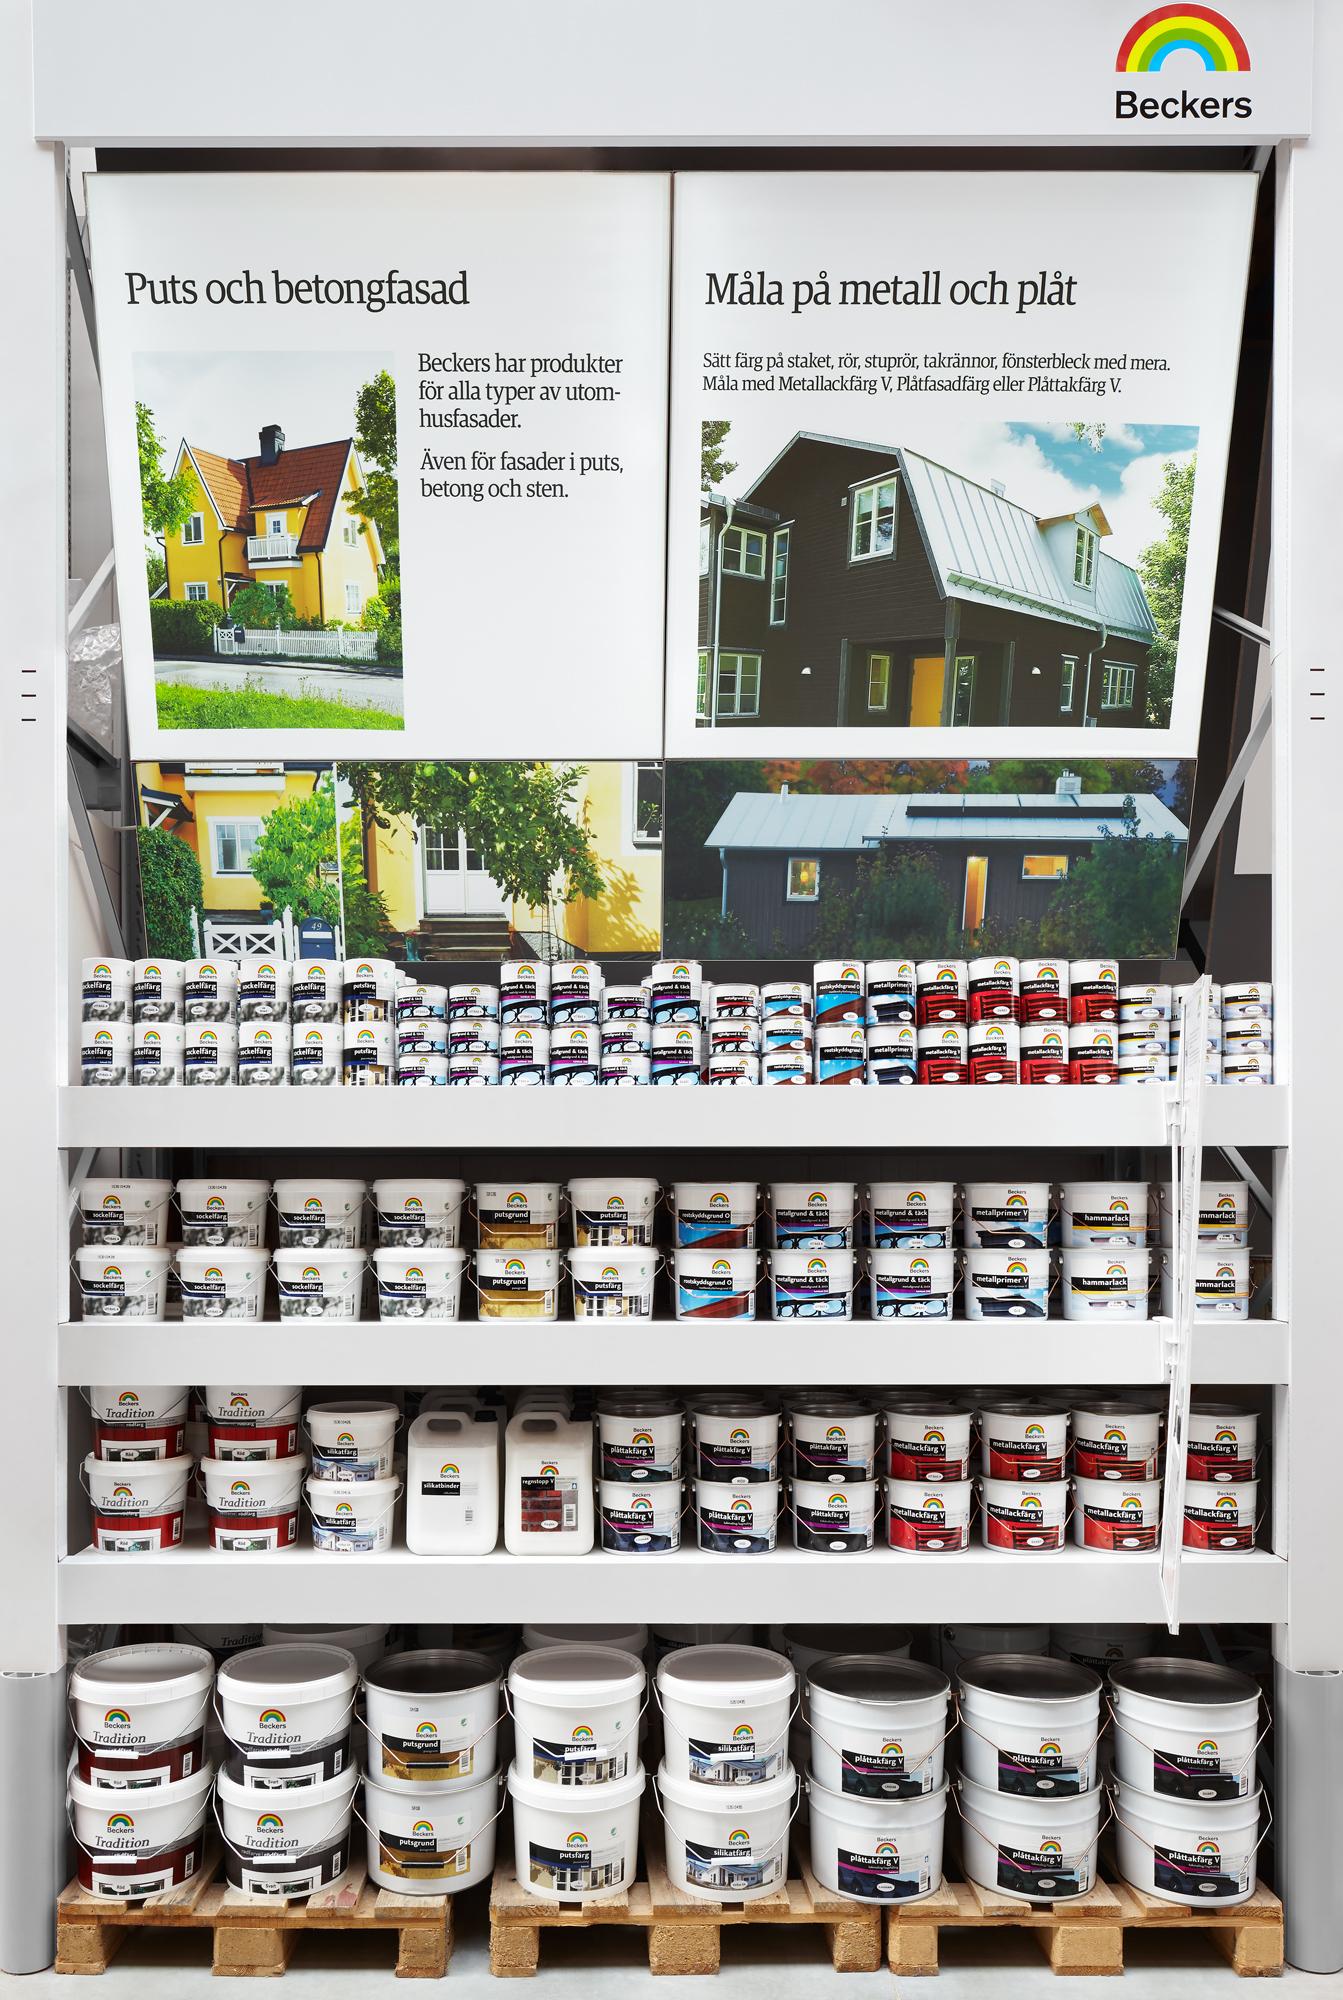 Beckers, Bauhaus Upplands Väsby Linus Berglund; Code Concept